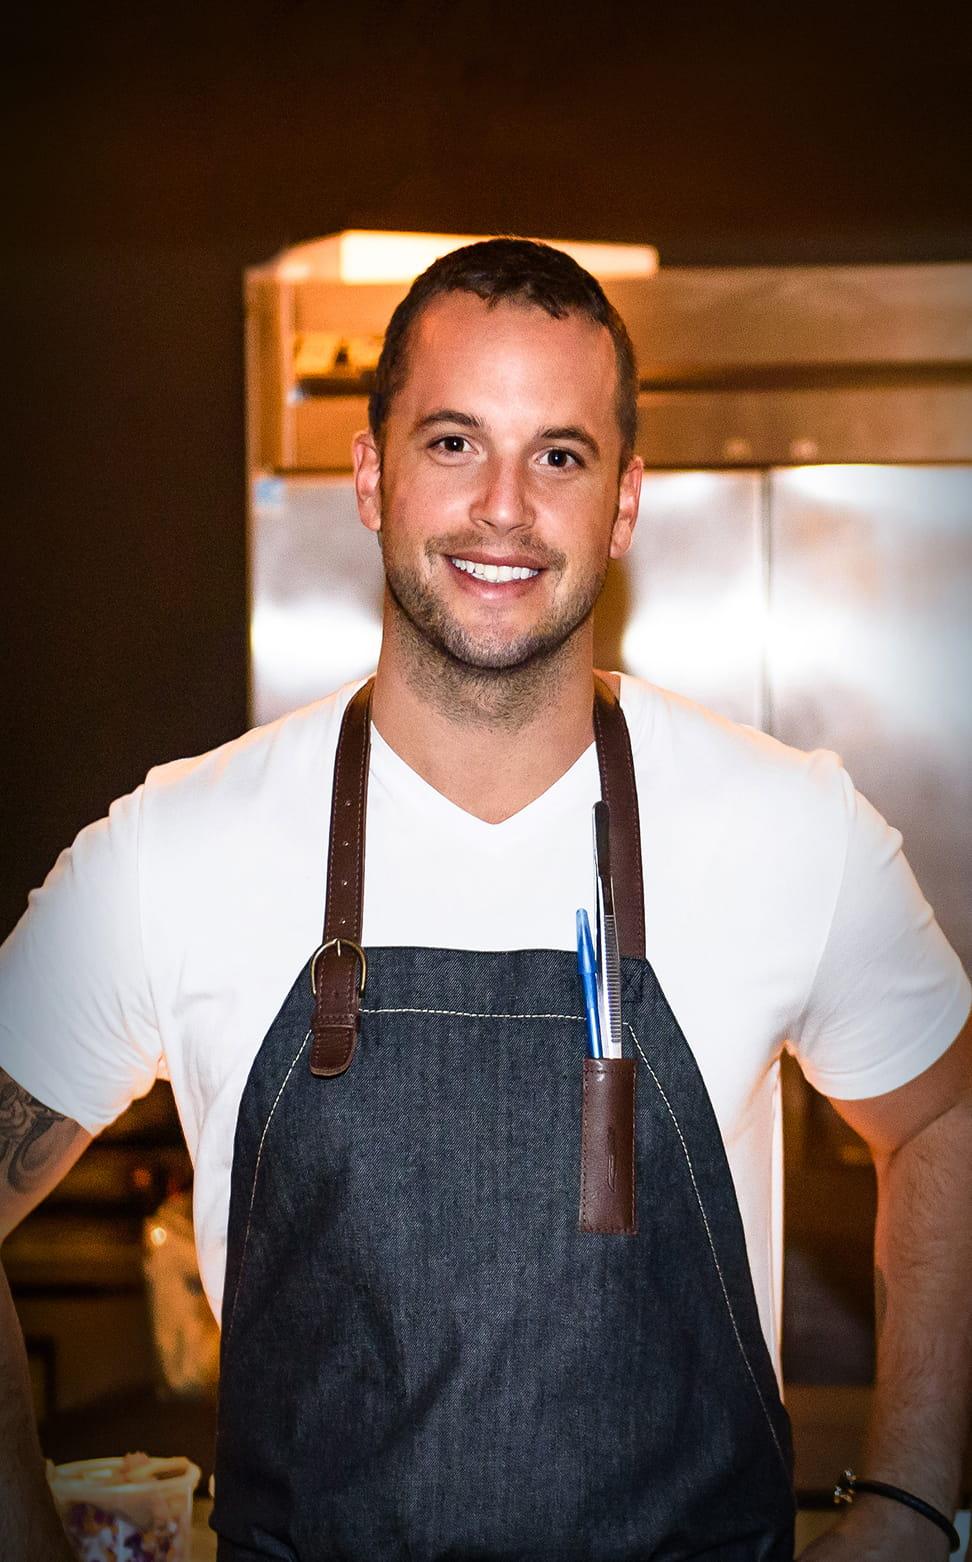 Chef Adrian Nieman